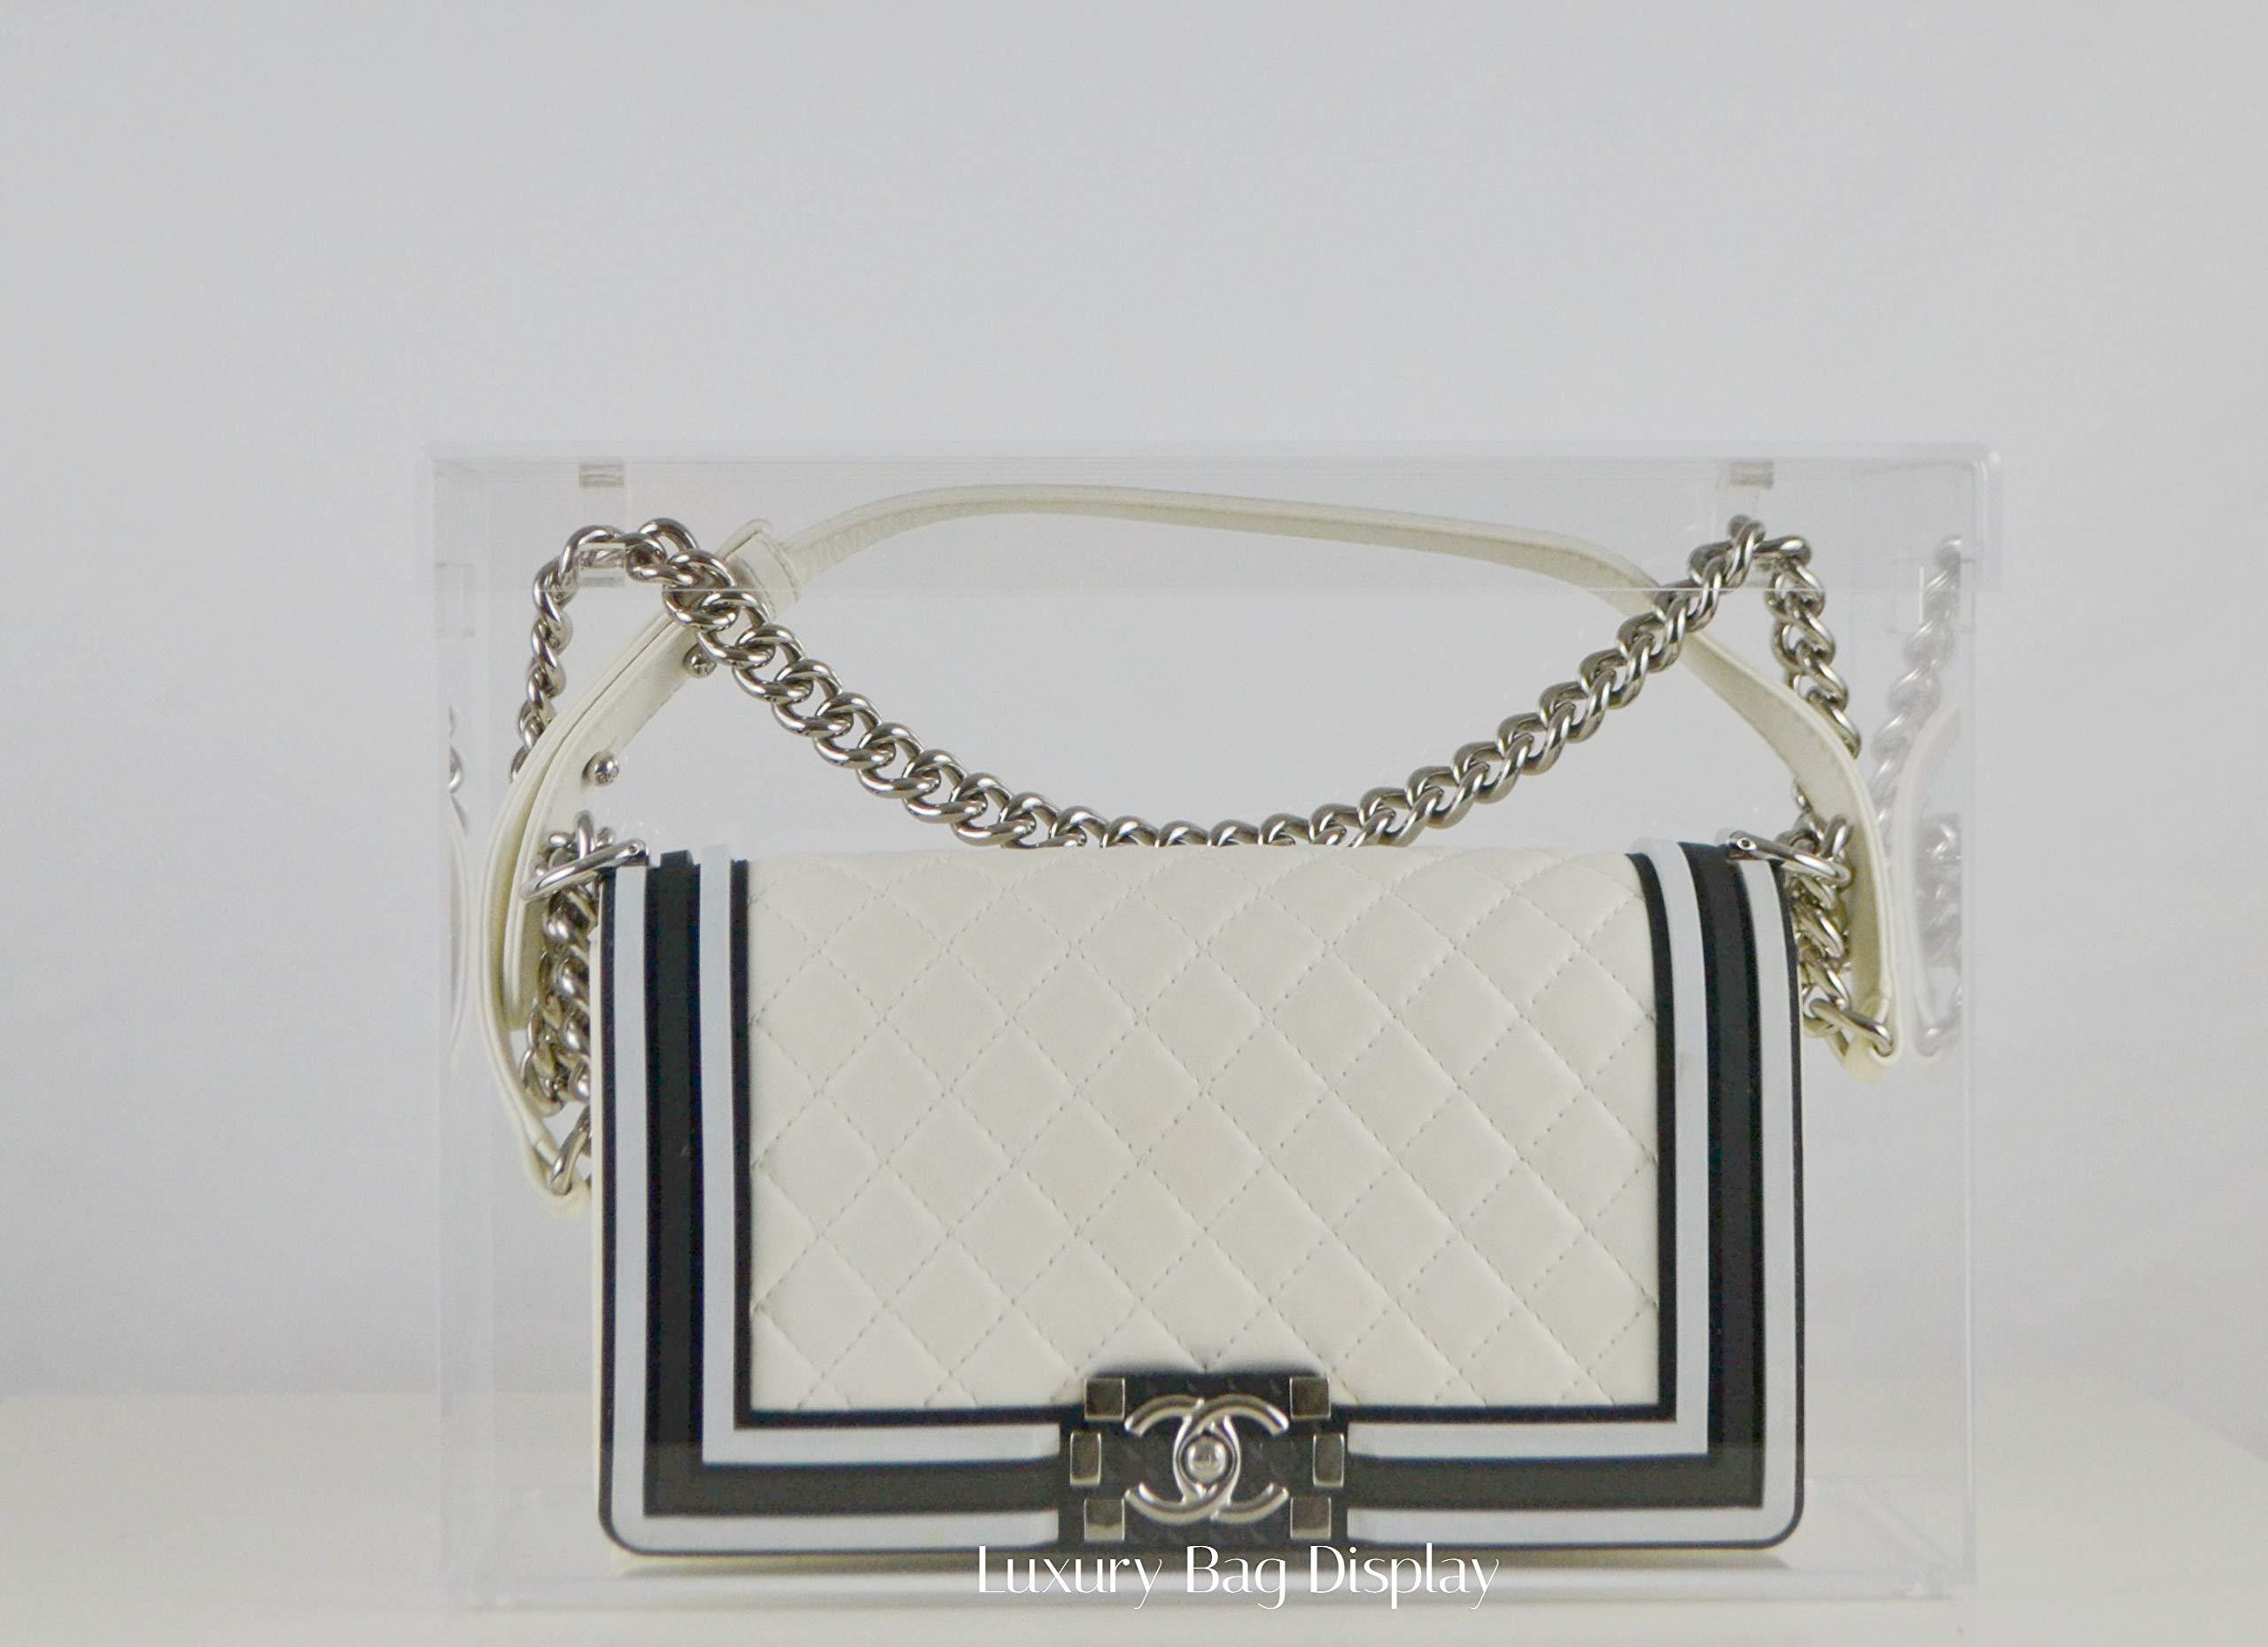 Luxury Bag Display Case Model C Medium Designed for Chanel Classic Flap